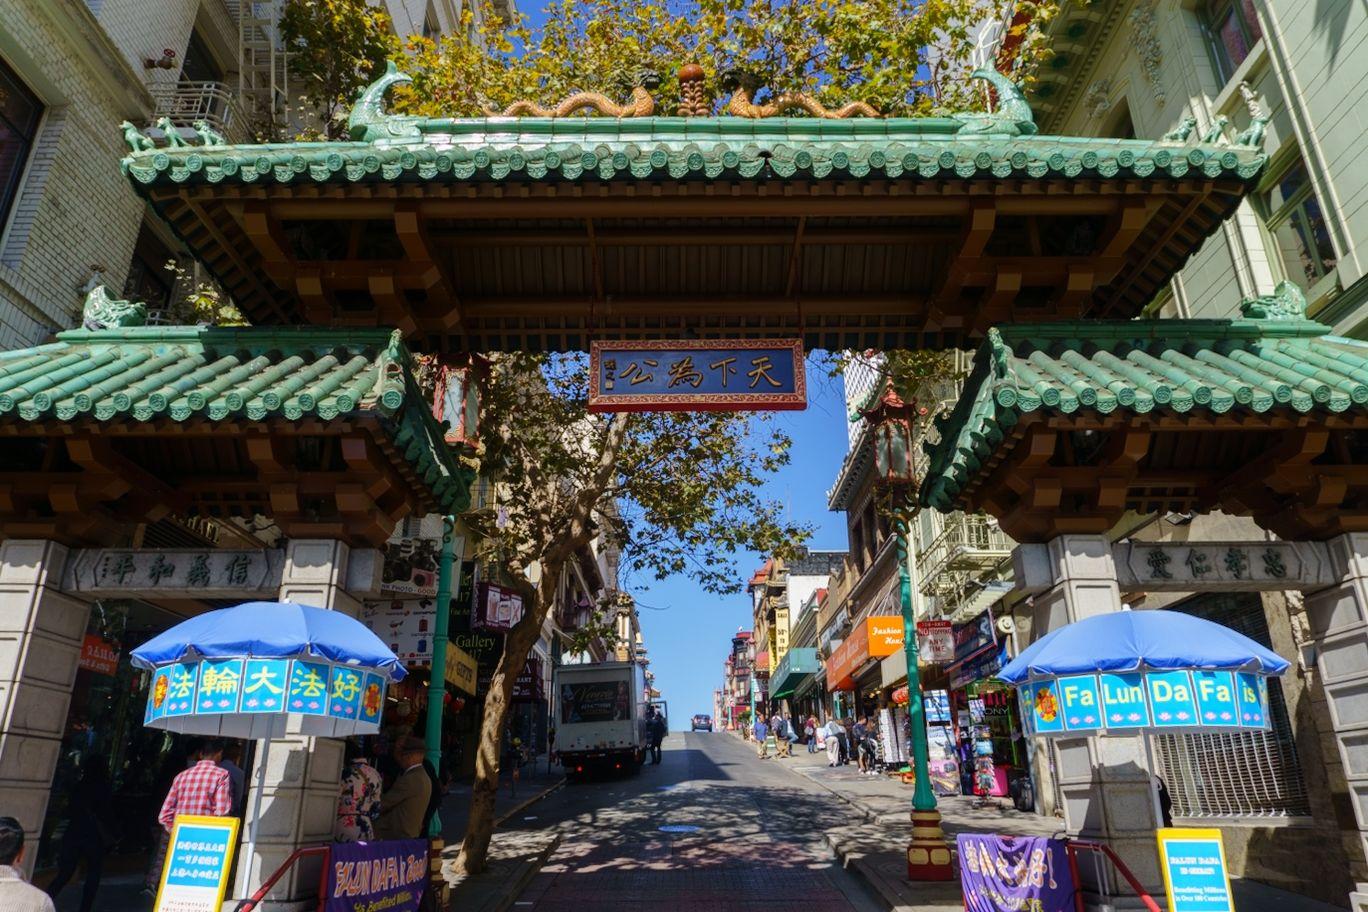 Photo of Chinatown By Sandeep Sreedhar